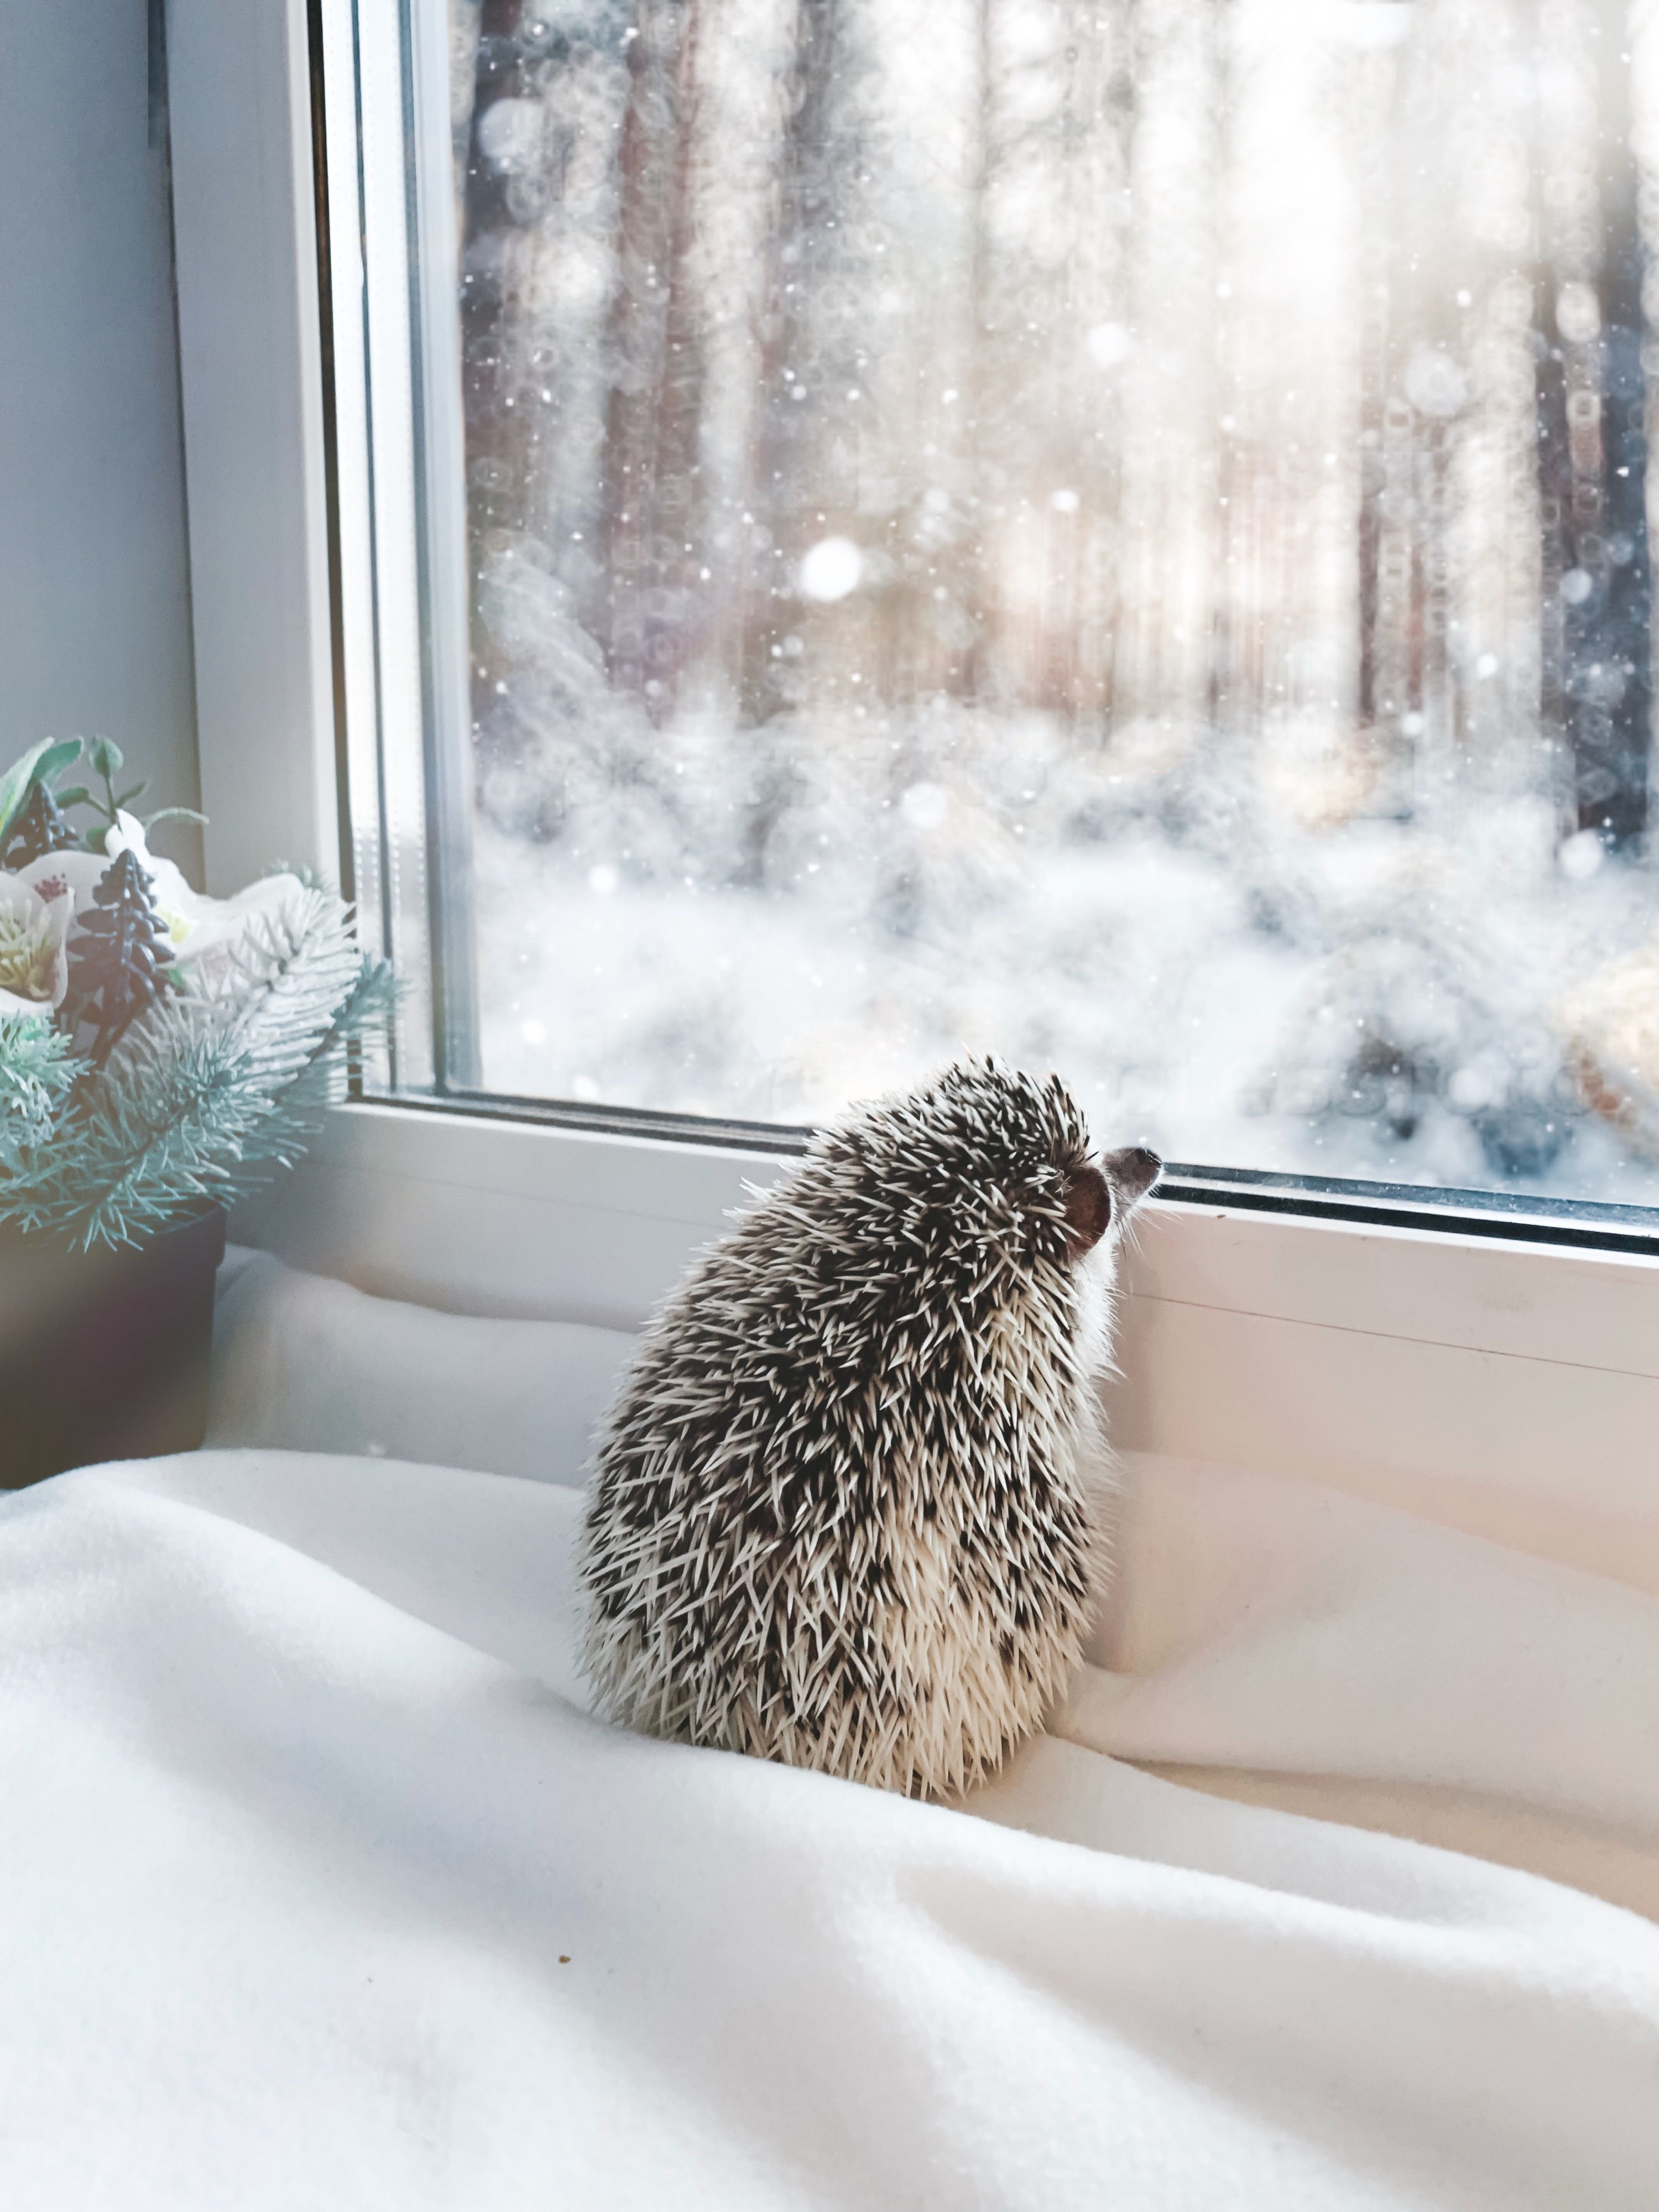 Картинка вот и зима пришла доброе утро